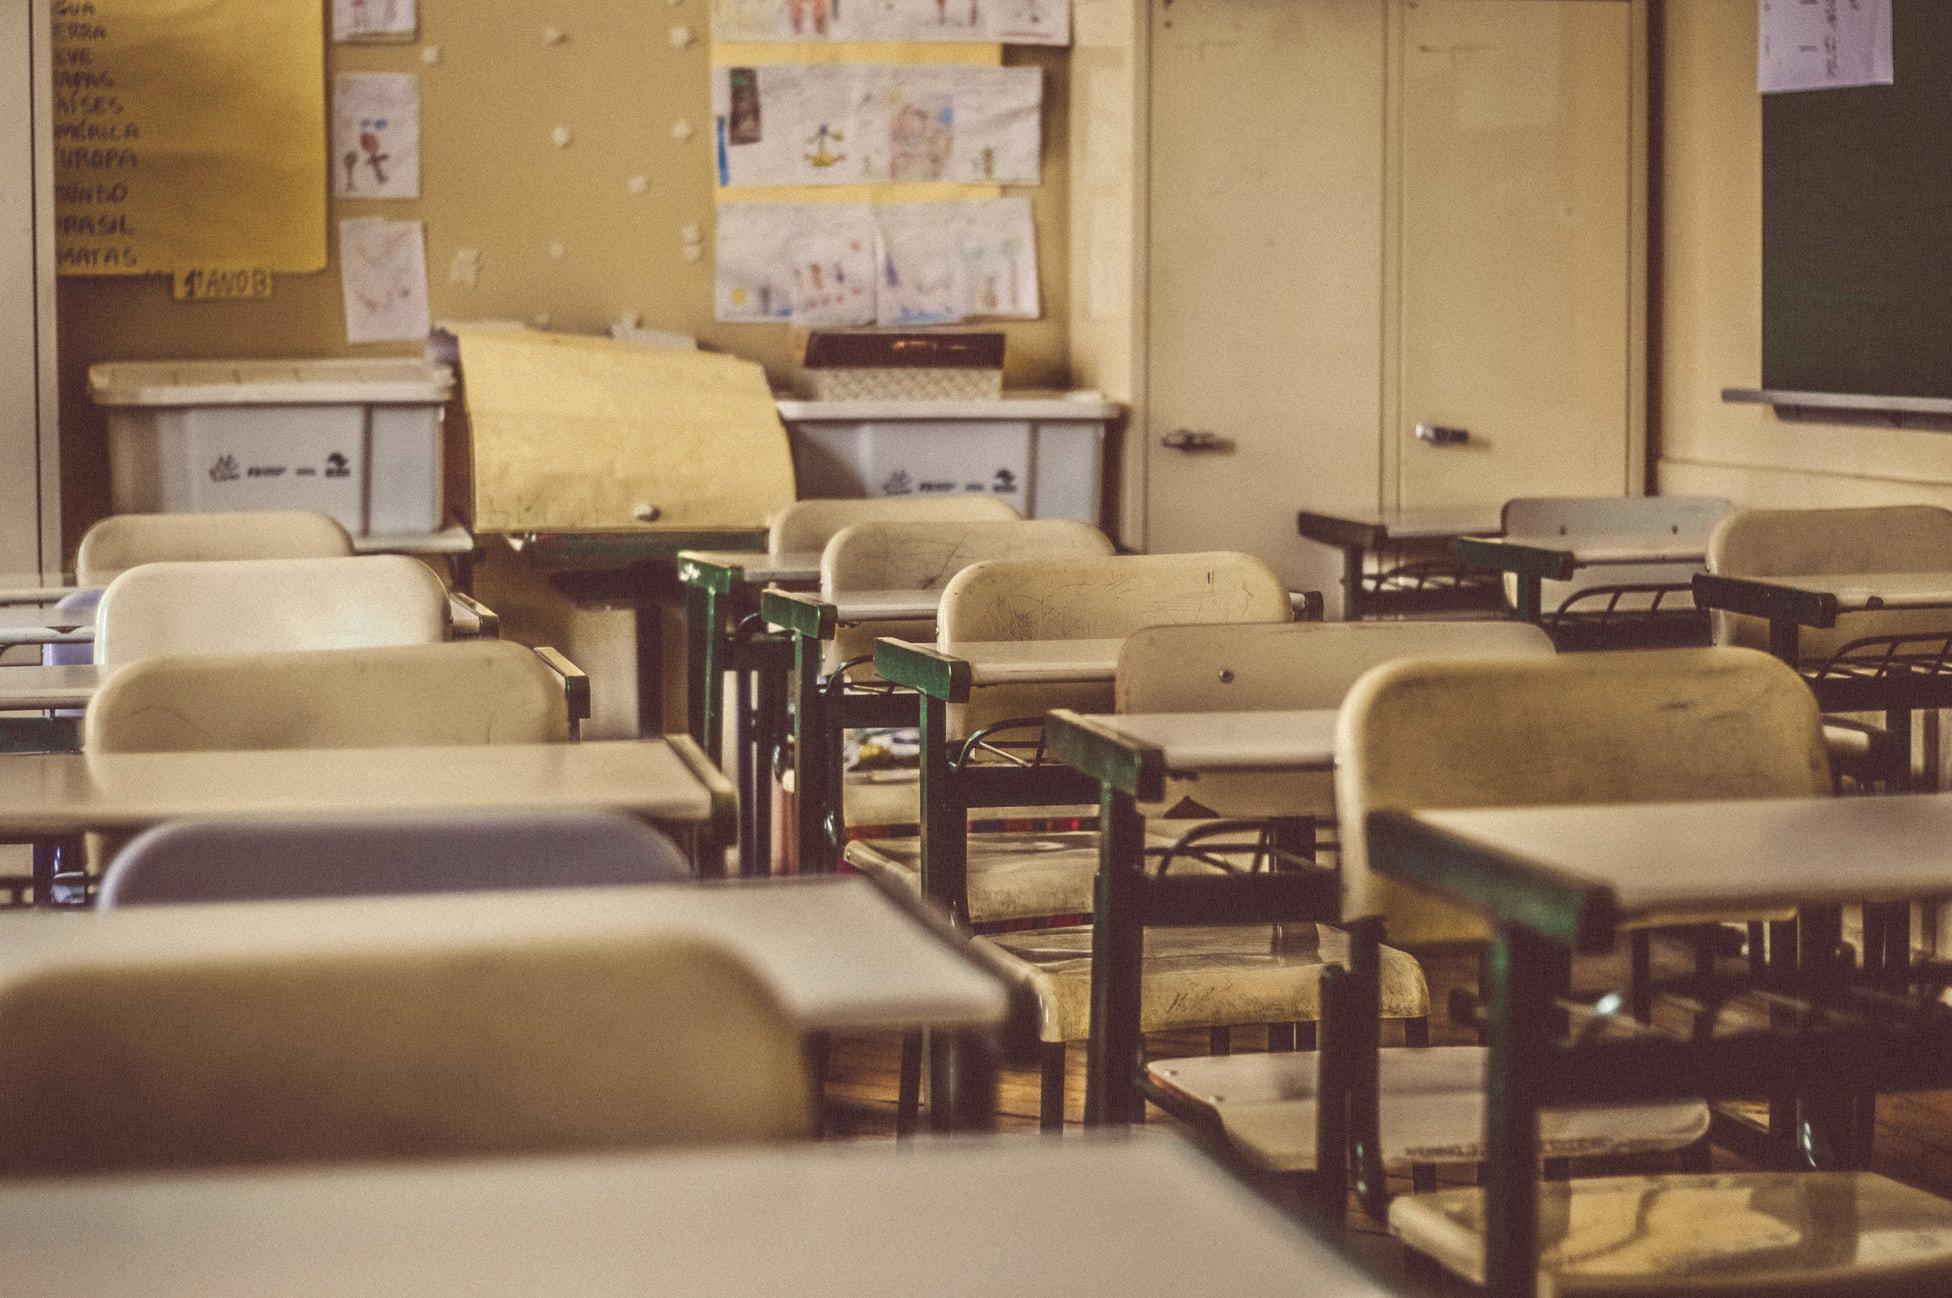 Classroom Constructions To Continue Despite Budget Cut Deped